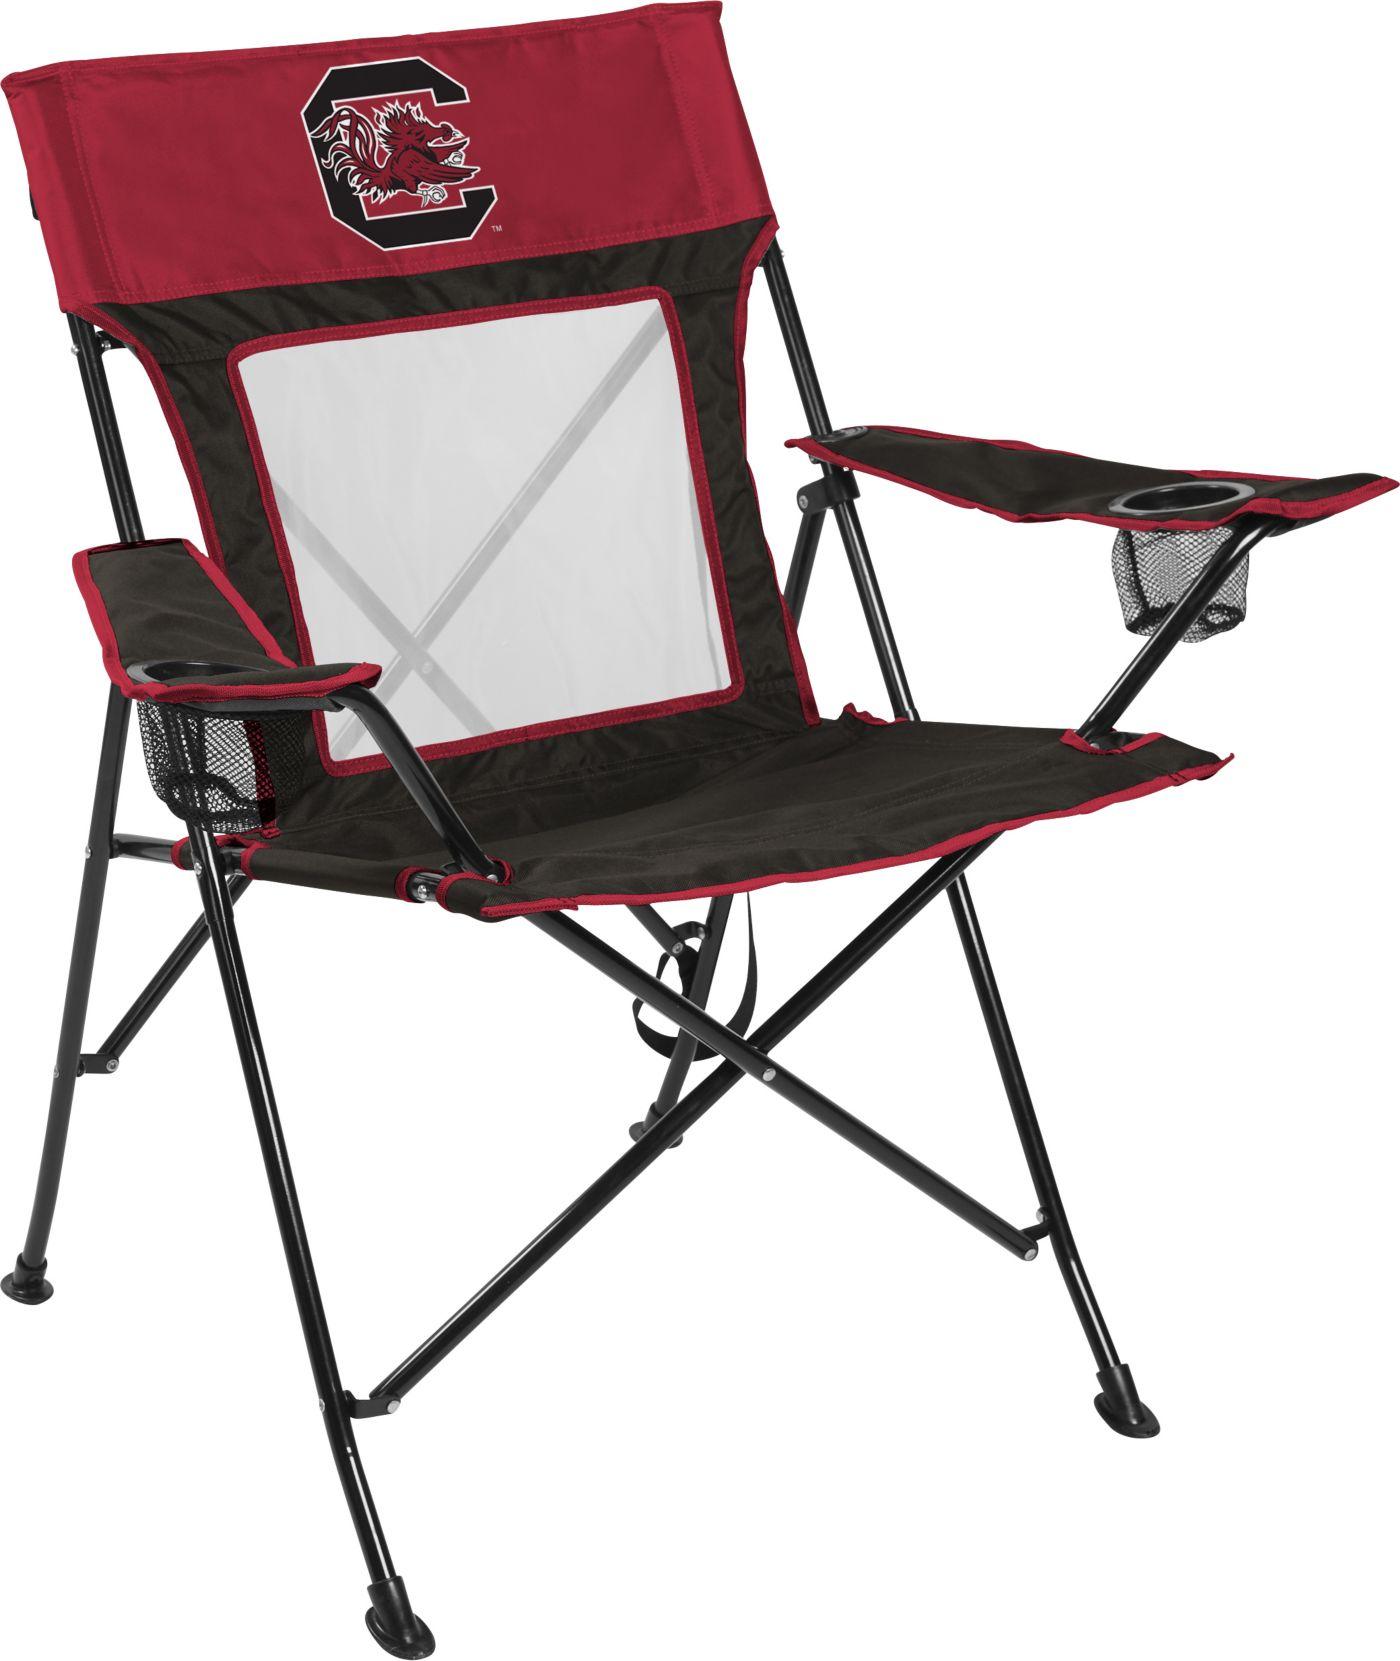 Rawlings South Carolina Gamecocks Game Changer Chair